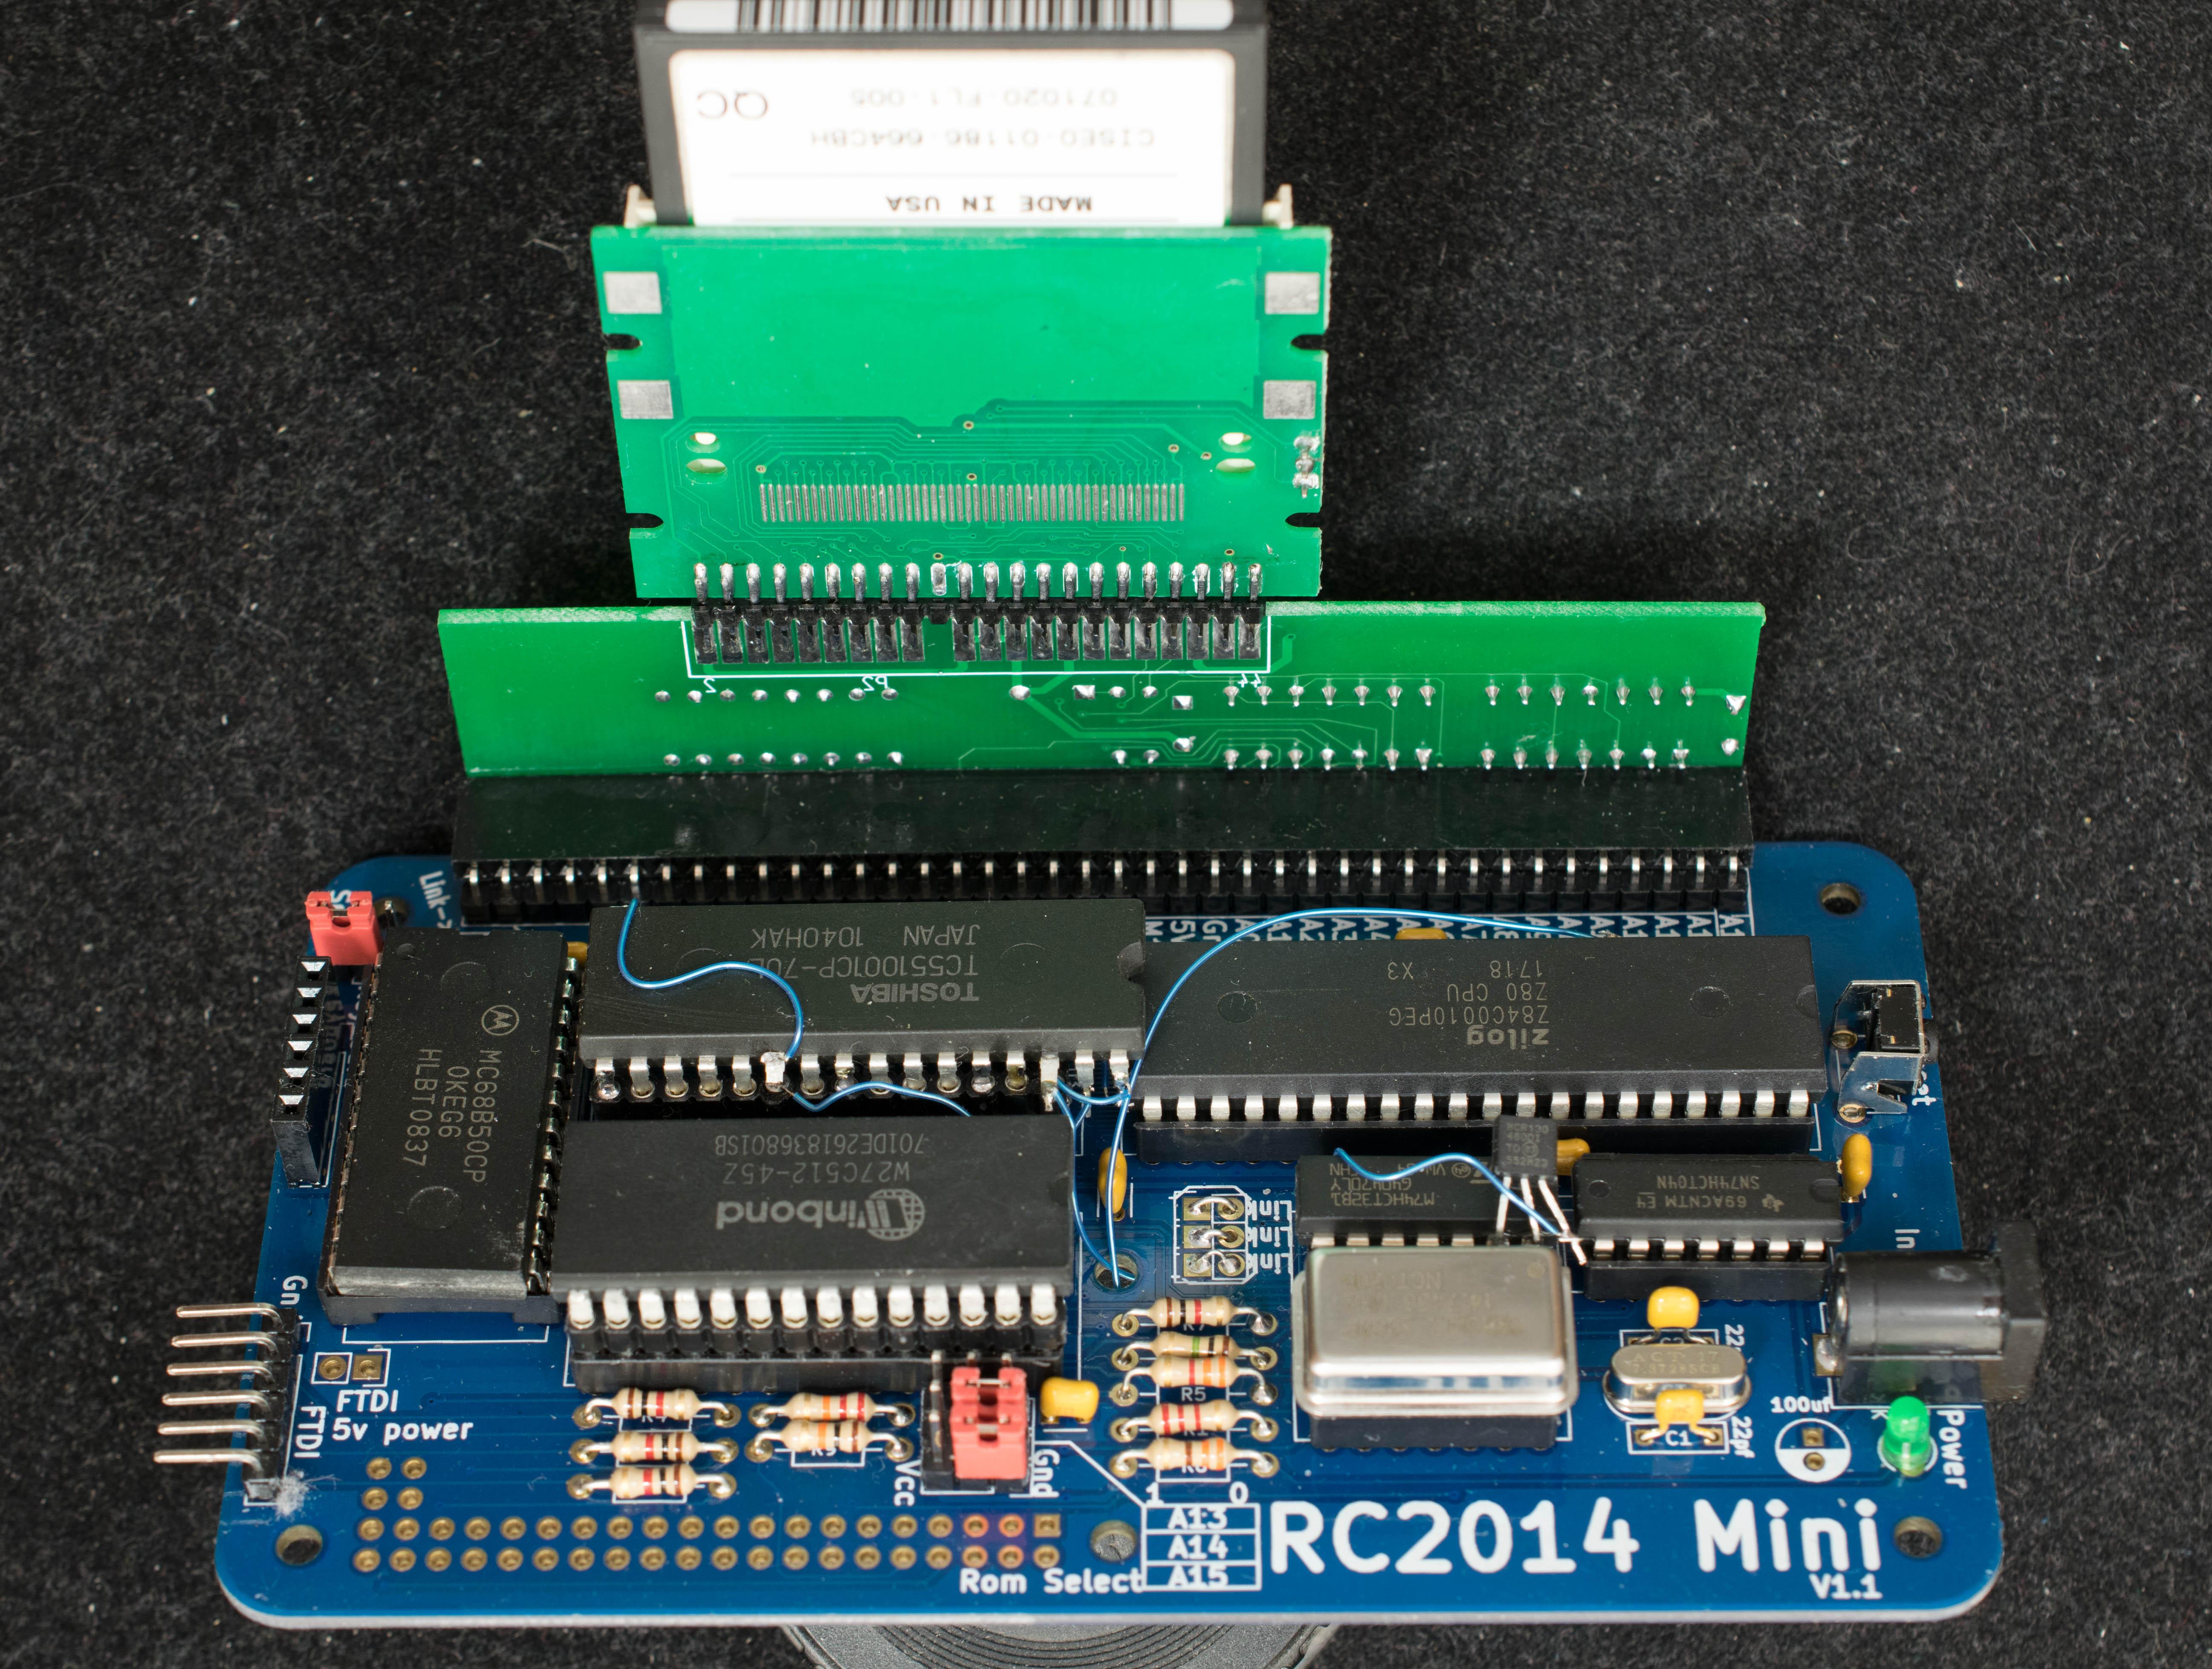 www.retrobrewcomputers.org_lib_plugins_ckgedit_fckeditor_userfiles_image_builderpages_plasmo_rc2014mini_upgrade_dsc_45210615.jpg